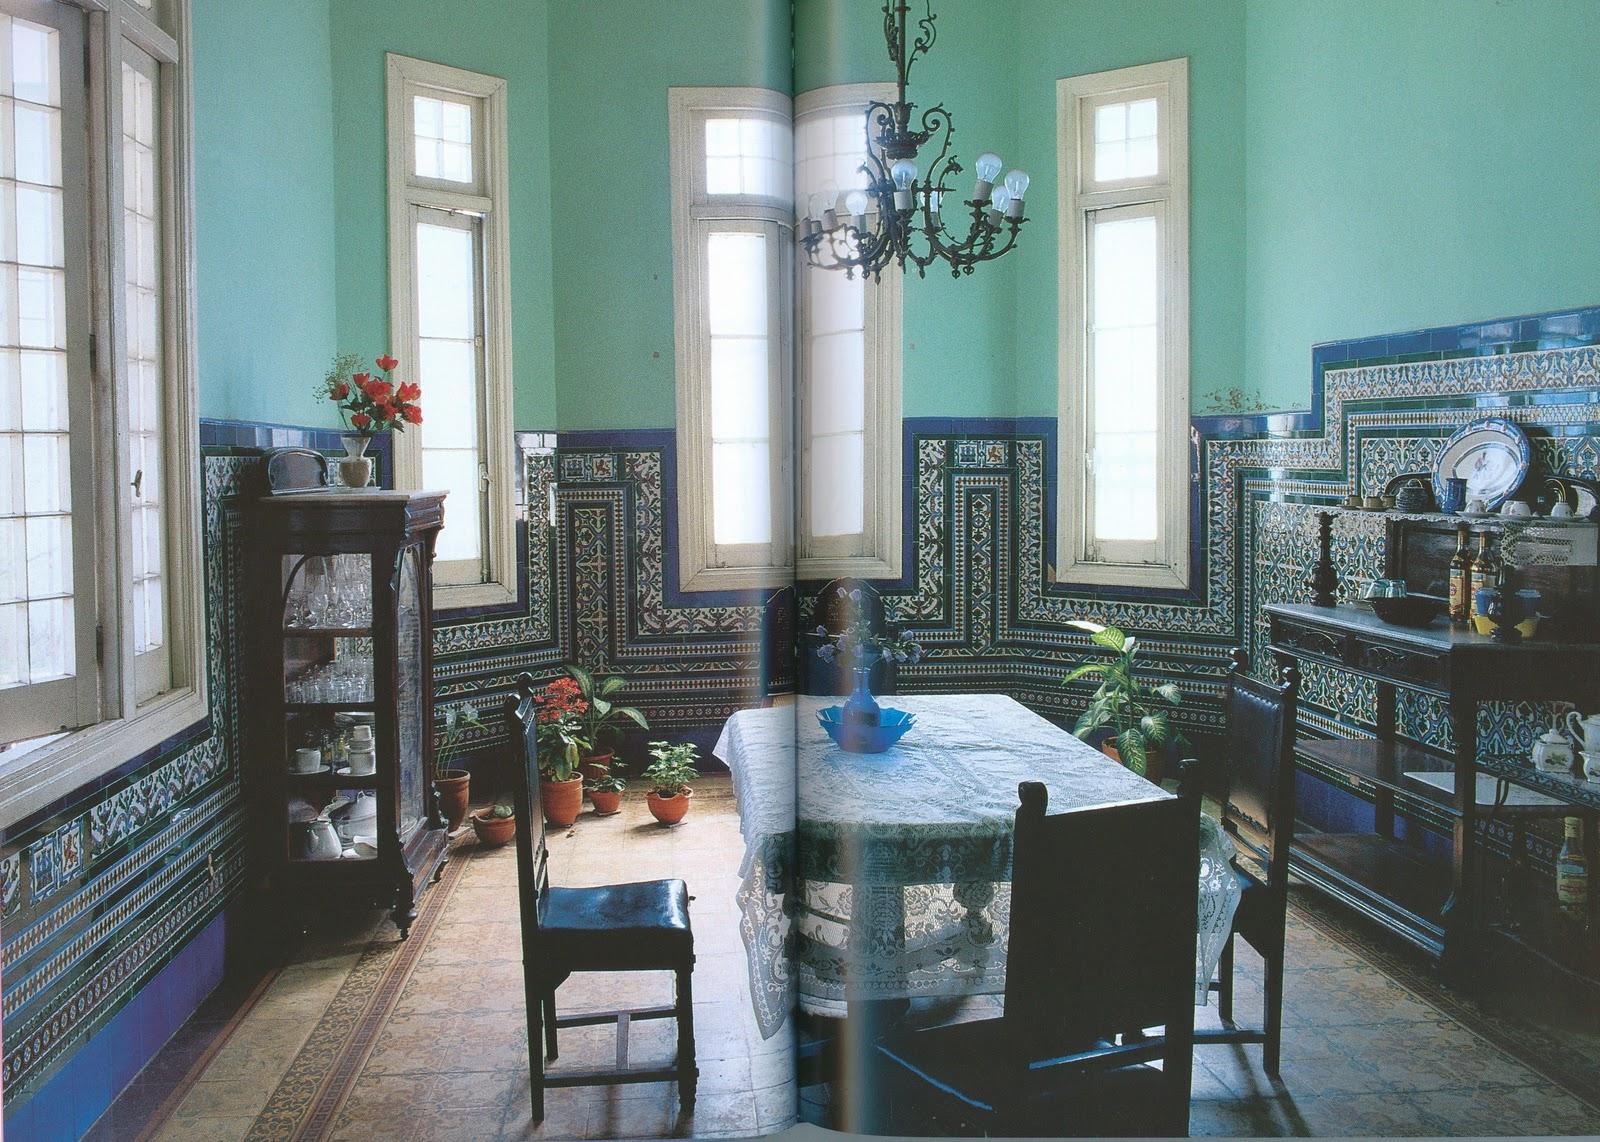 cuban style home decor home photo style cuban inspired home decor decoratorsbest blog